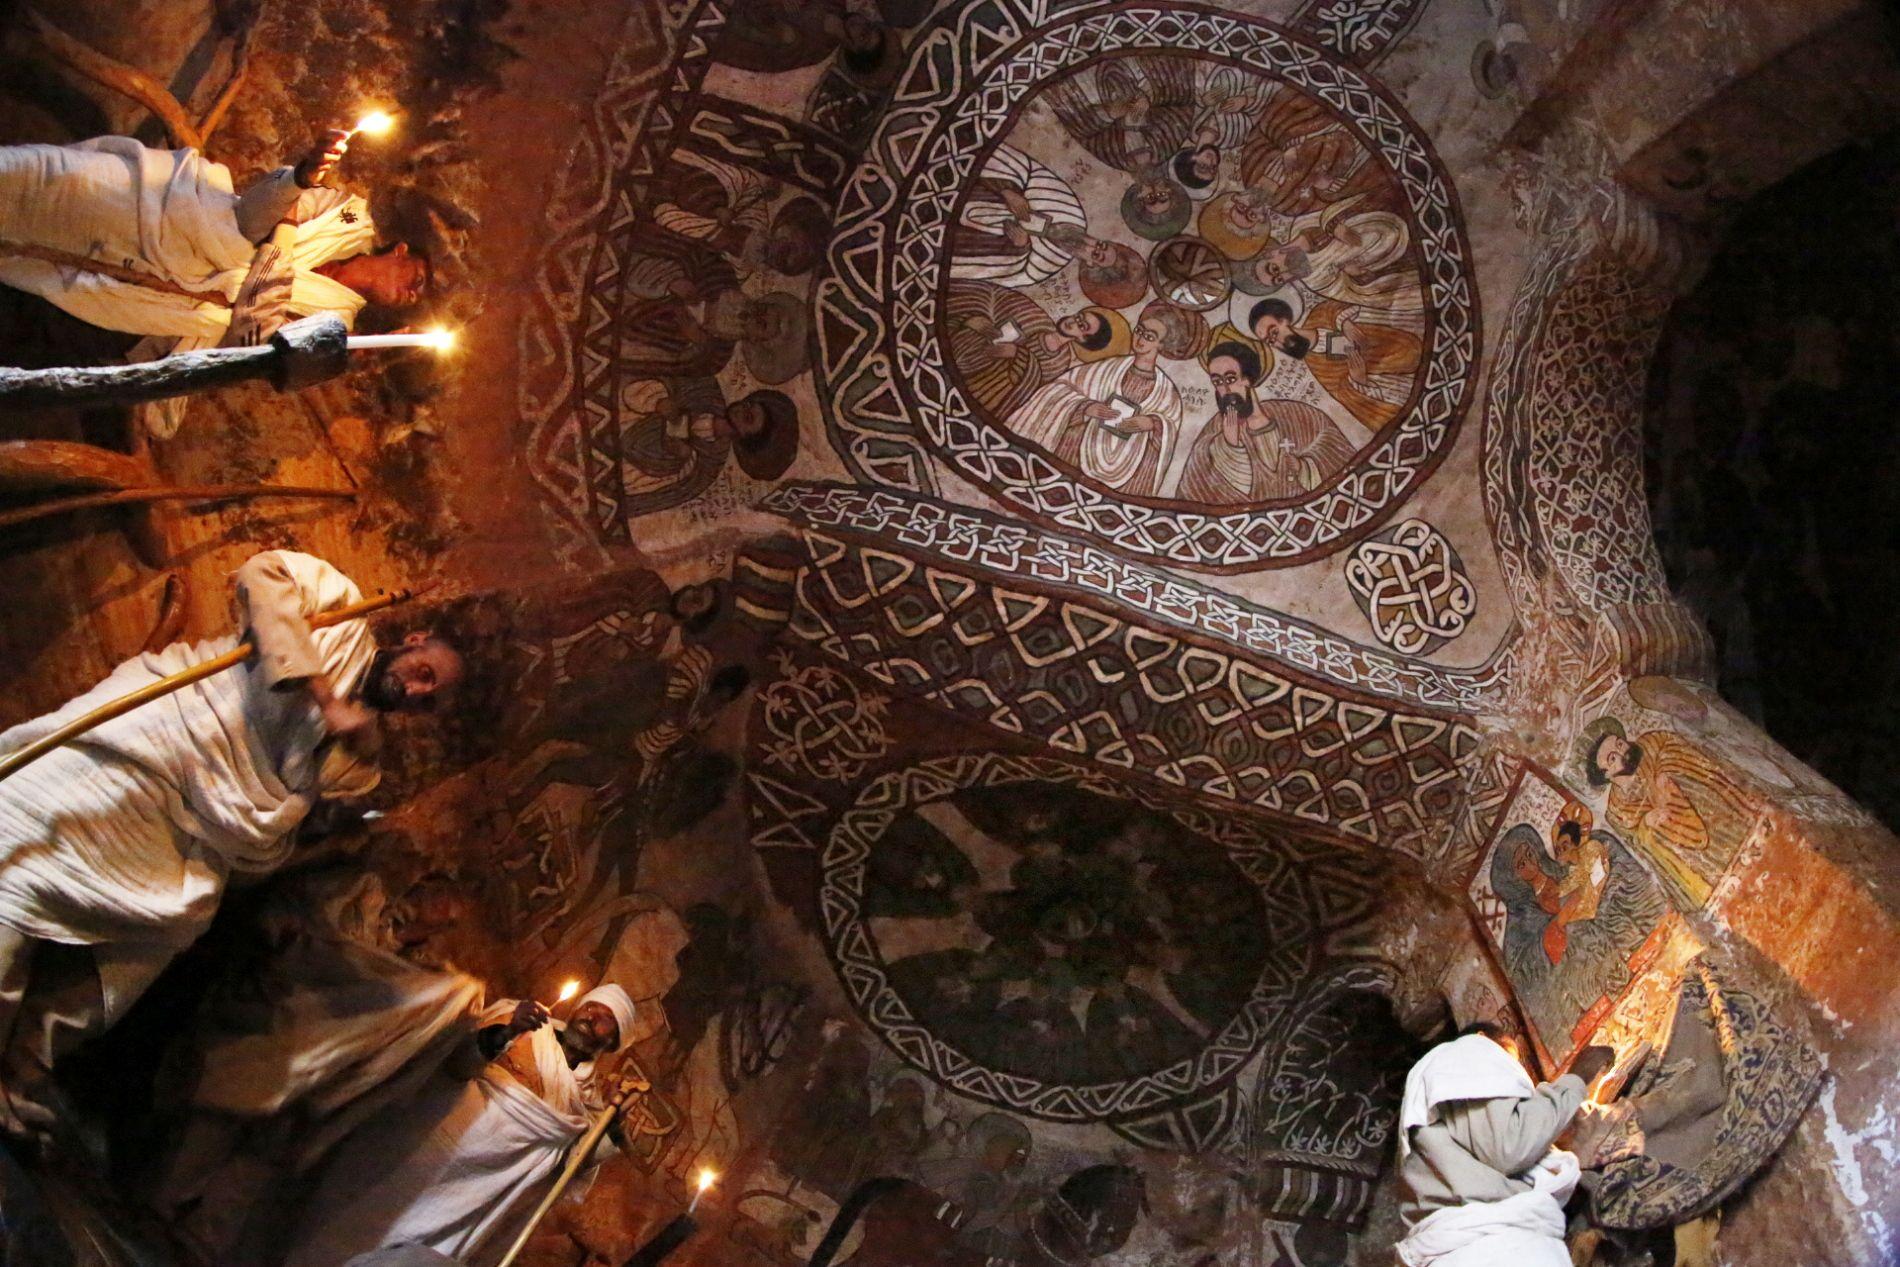 Rock´s Church Ceiling, Hawzen in Ethiopia by Kazuyohi Nomachi: